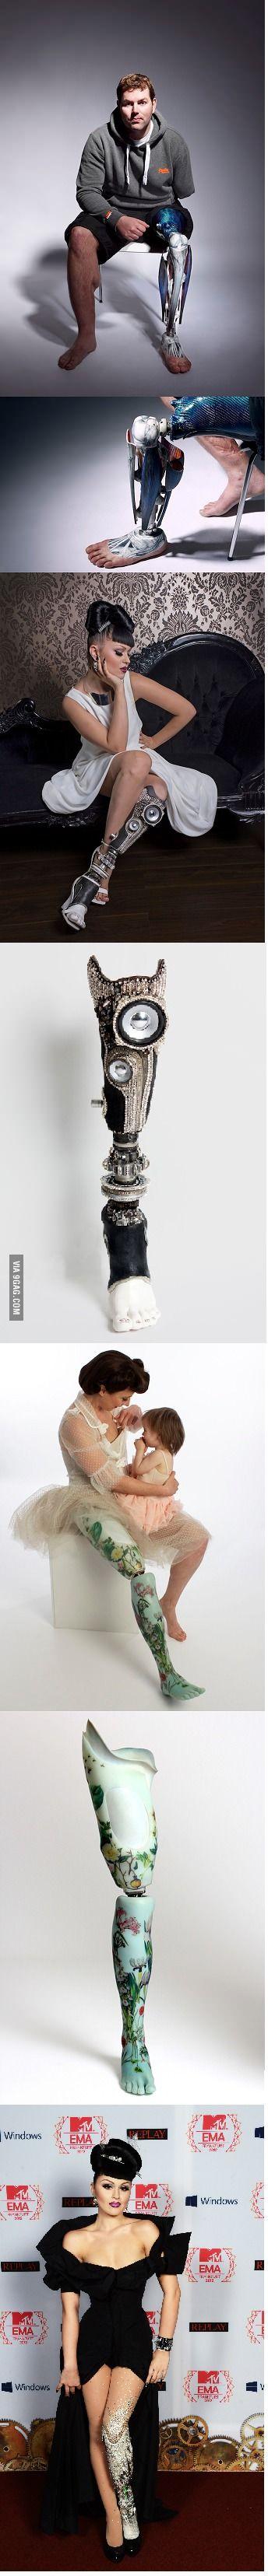 Cool stuff ~ designer prosthetics